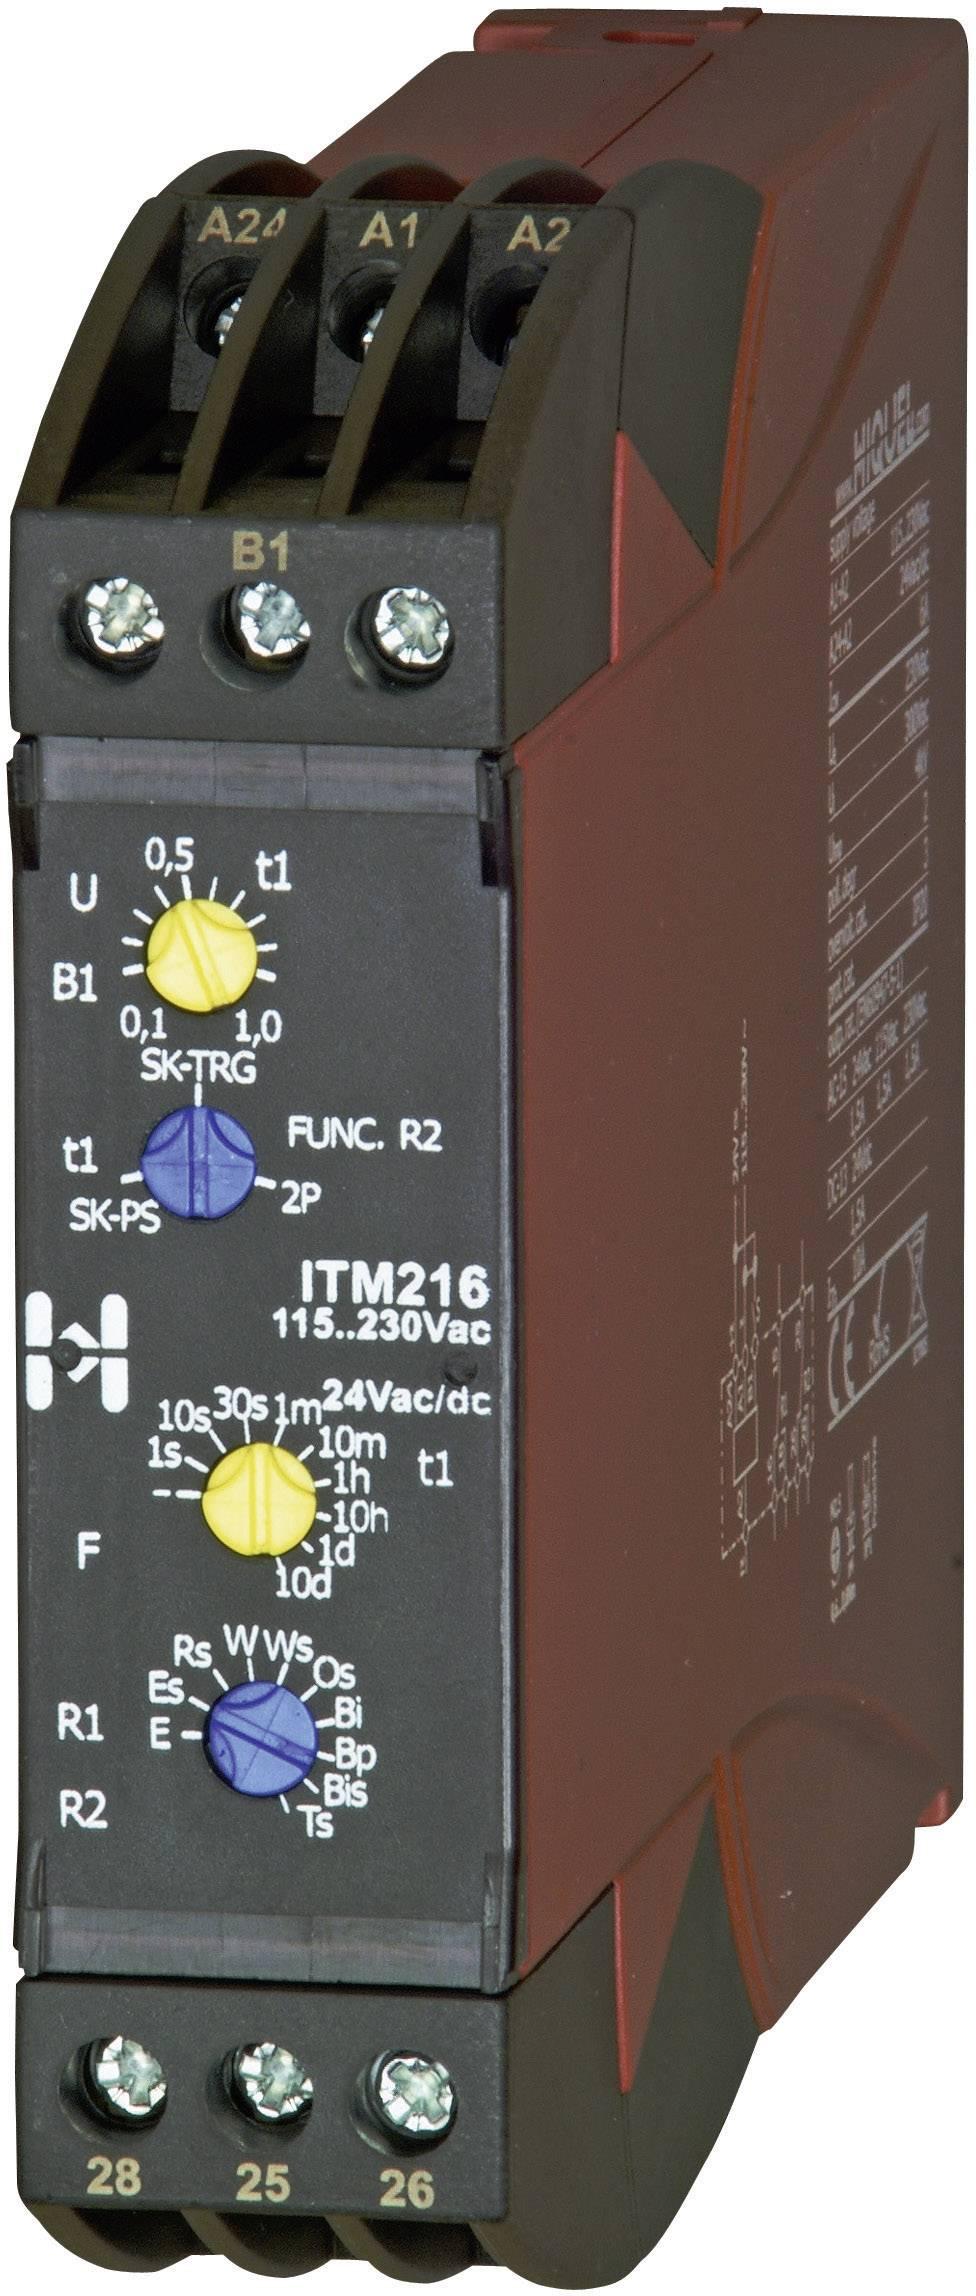 Časové relé multifunkčné Hiquel in-case ITM 216, 2 prepínacie, 1 ks